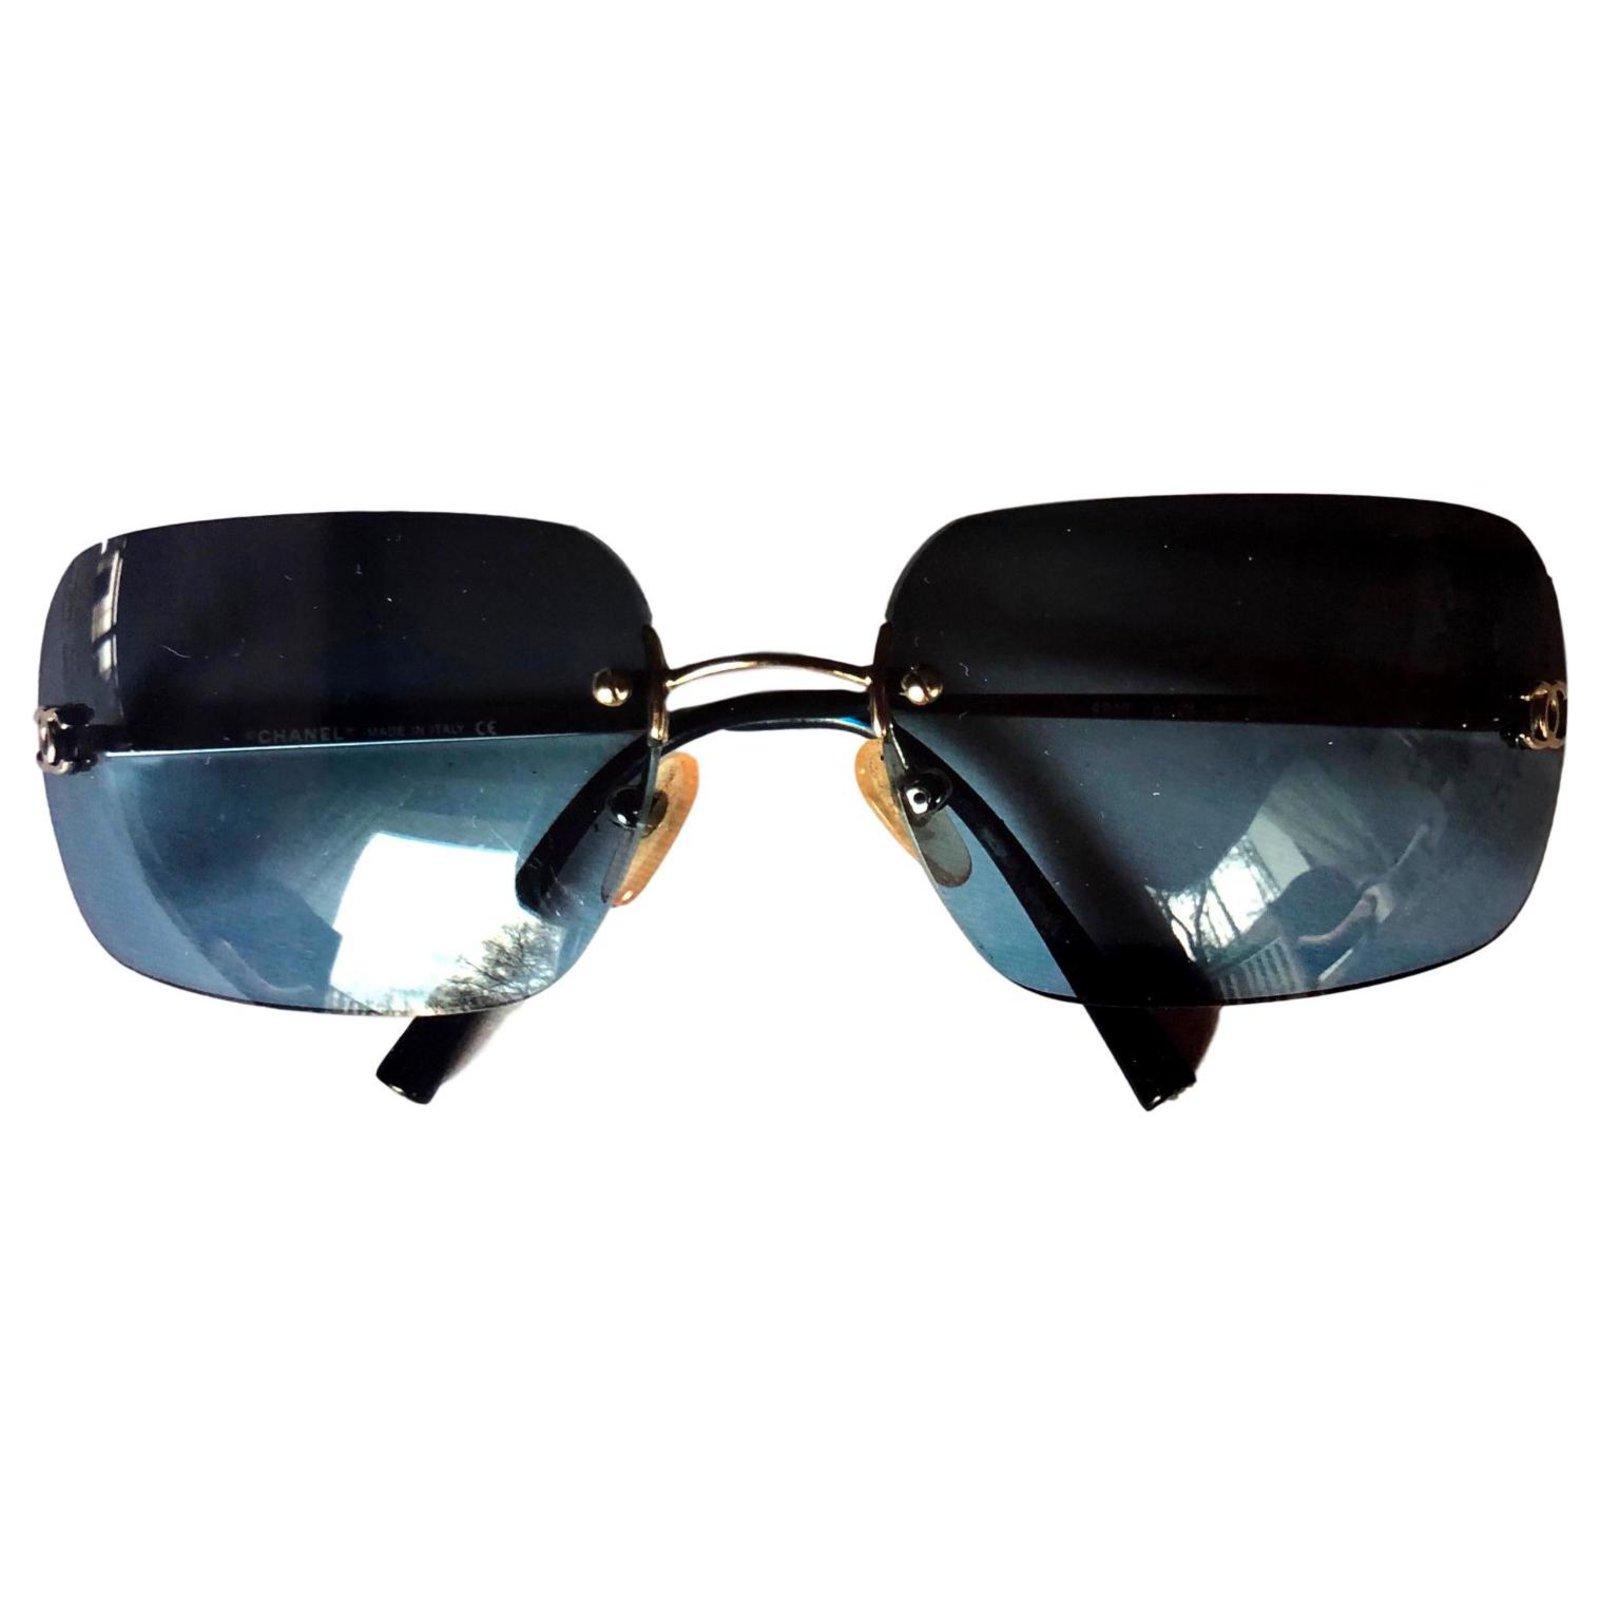 7e2e79dbb8 Chanel Chanel vintage glasses Sunglasses Metal Blue ref.120031 ...